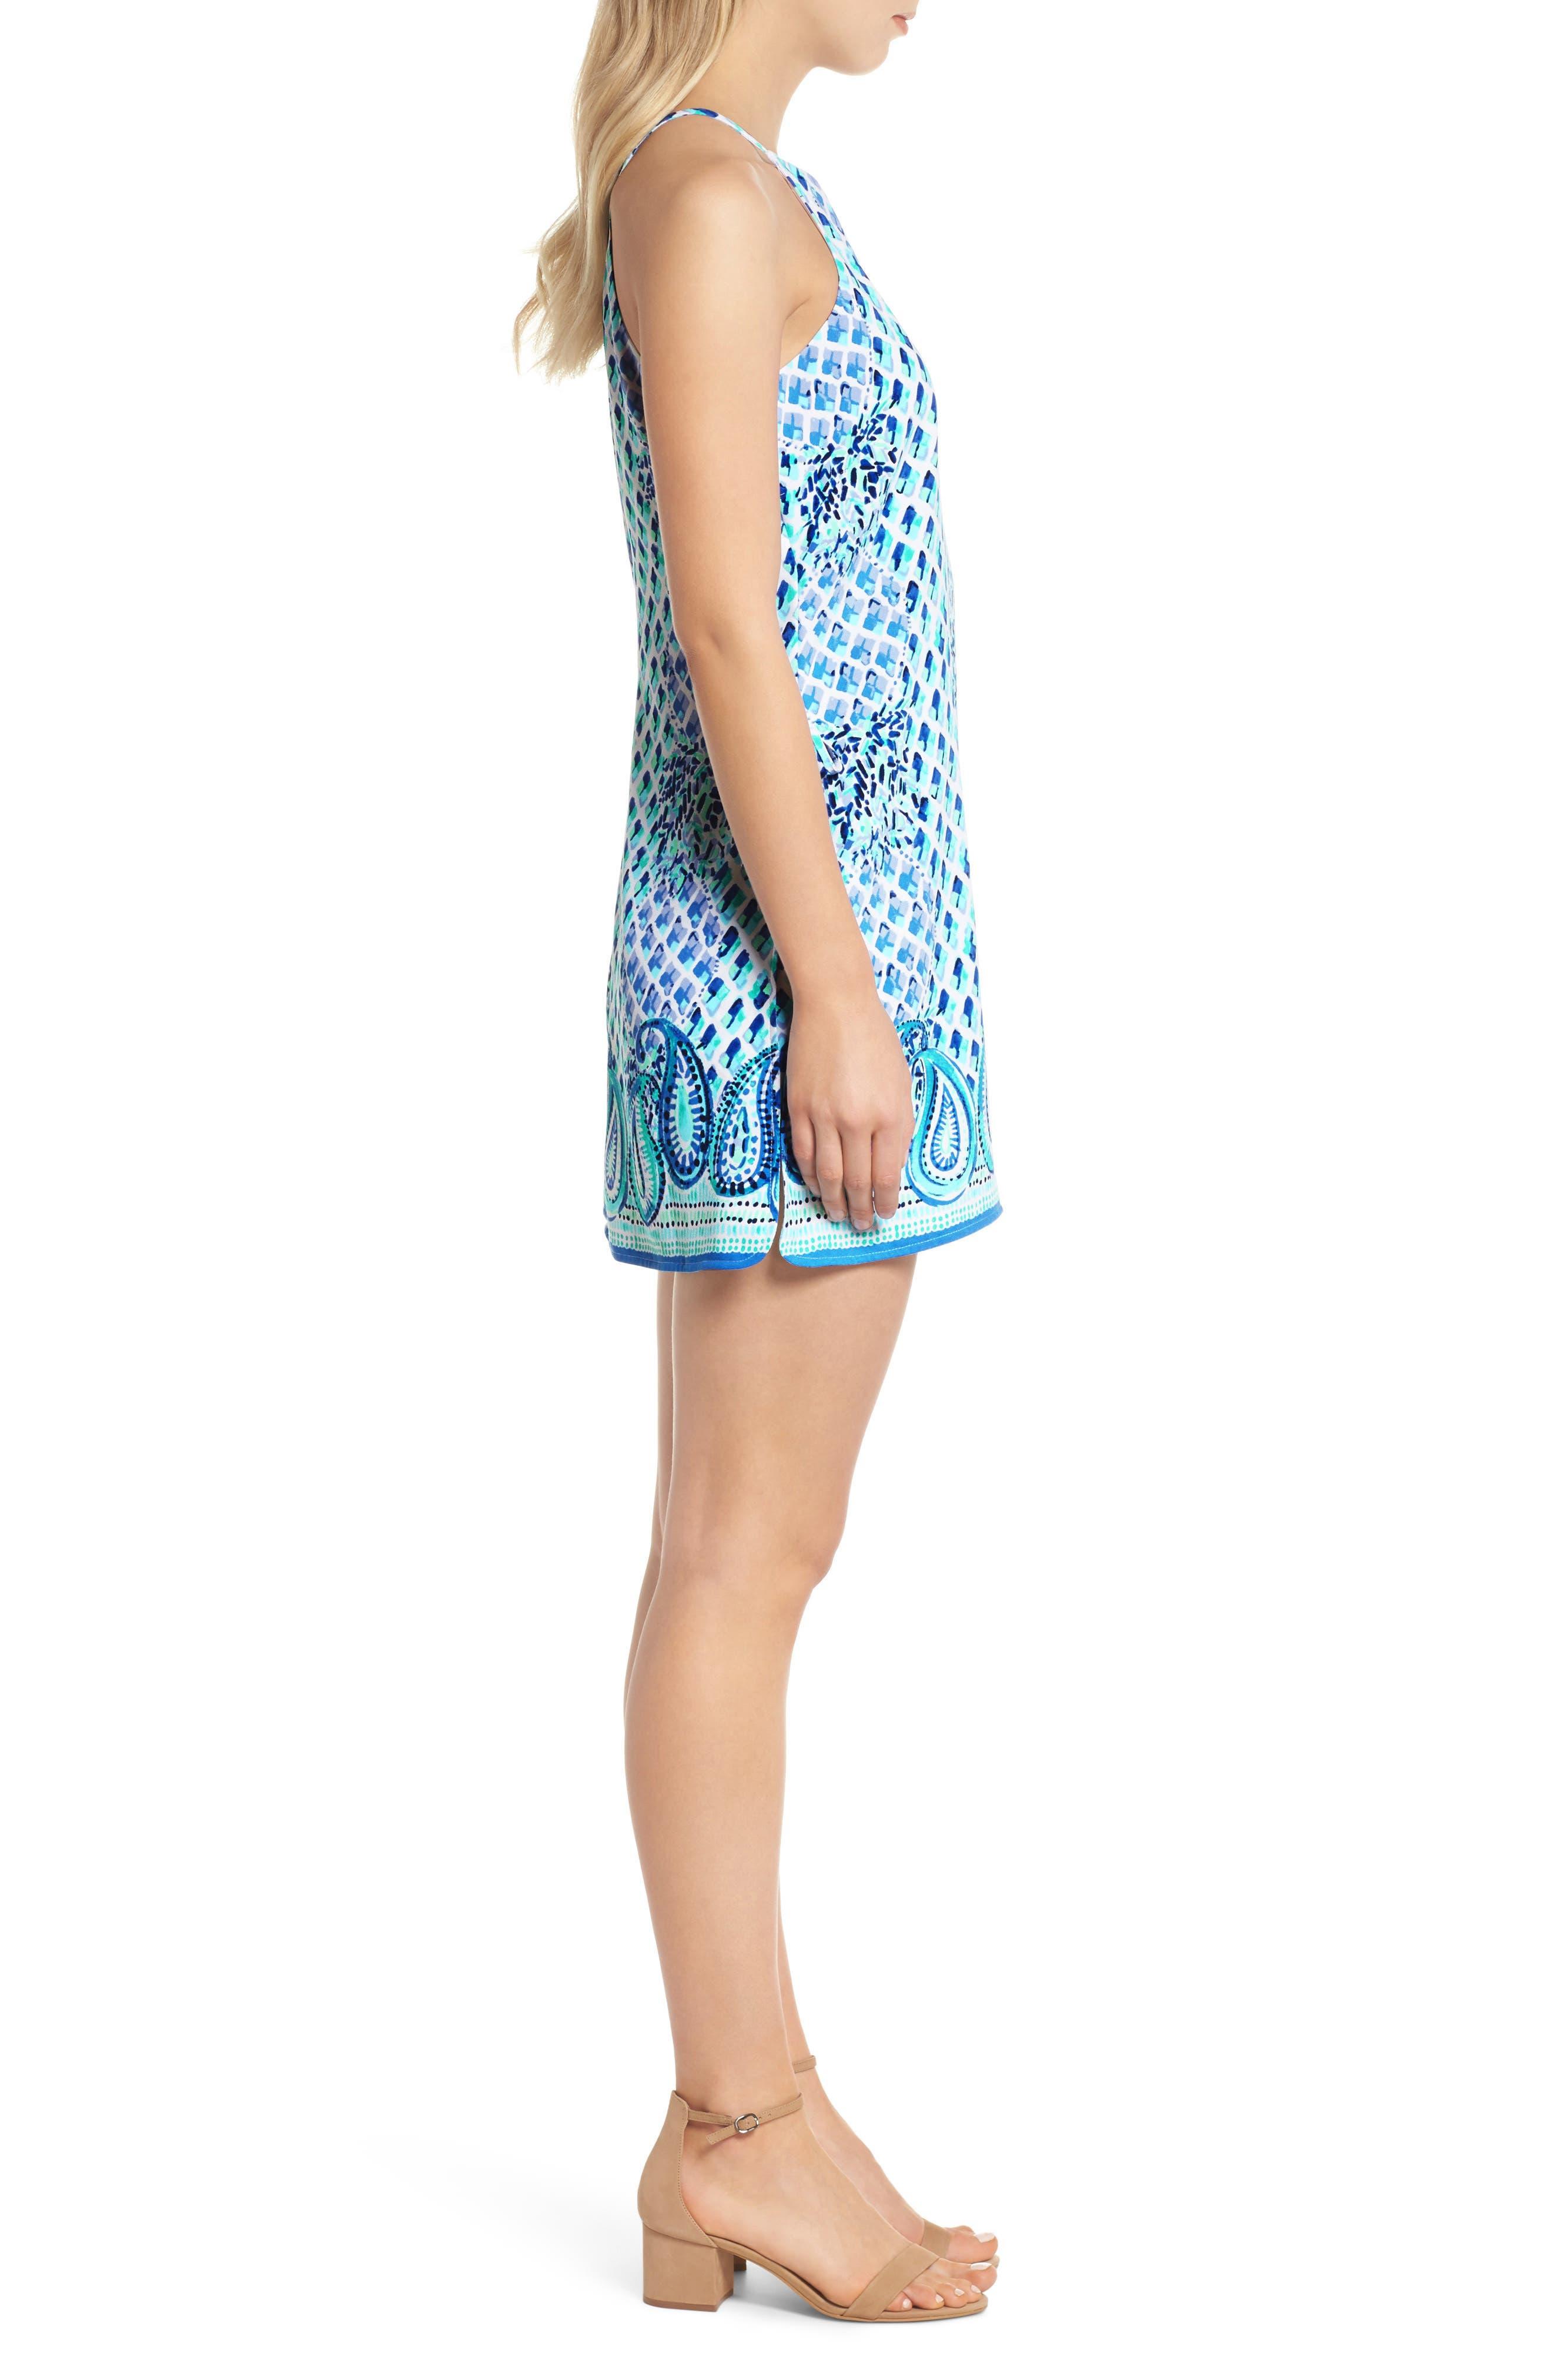 Pearl Romper Dress,                             Alternate thumbnail 3, color,                             Resort White Toe In